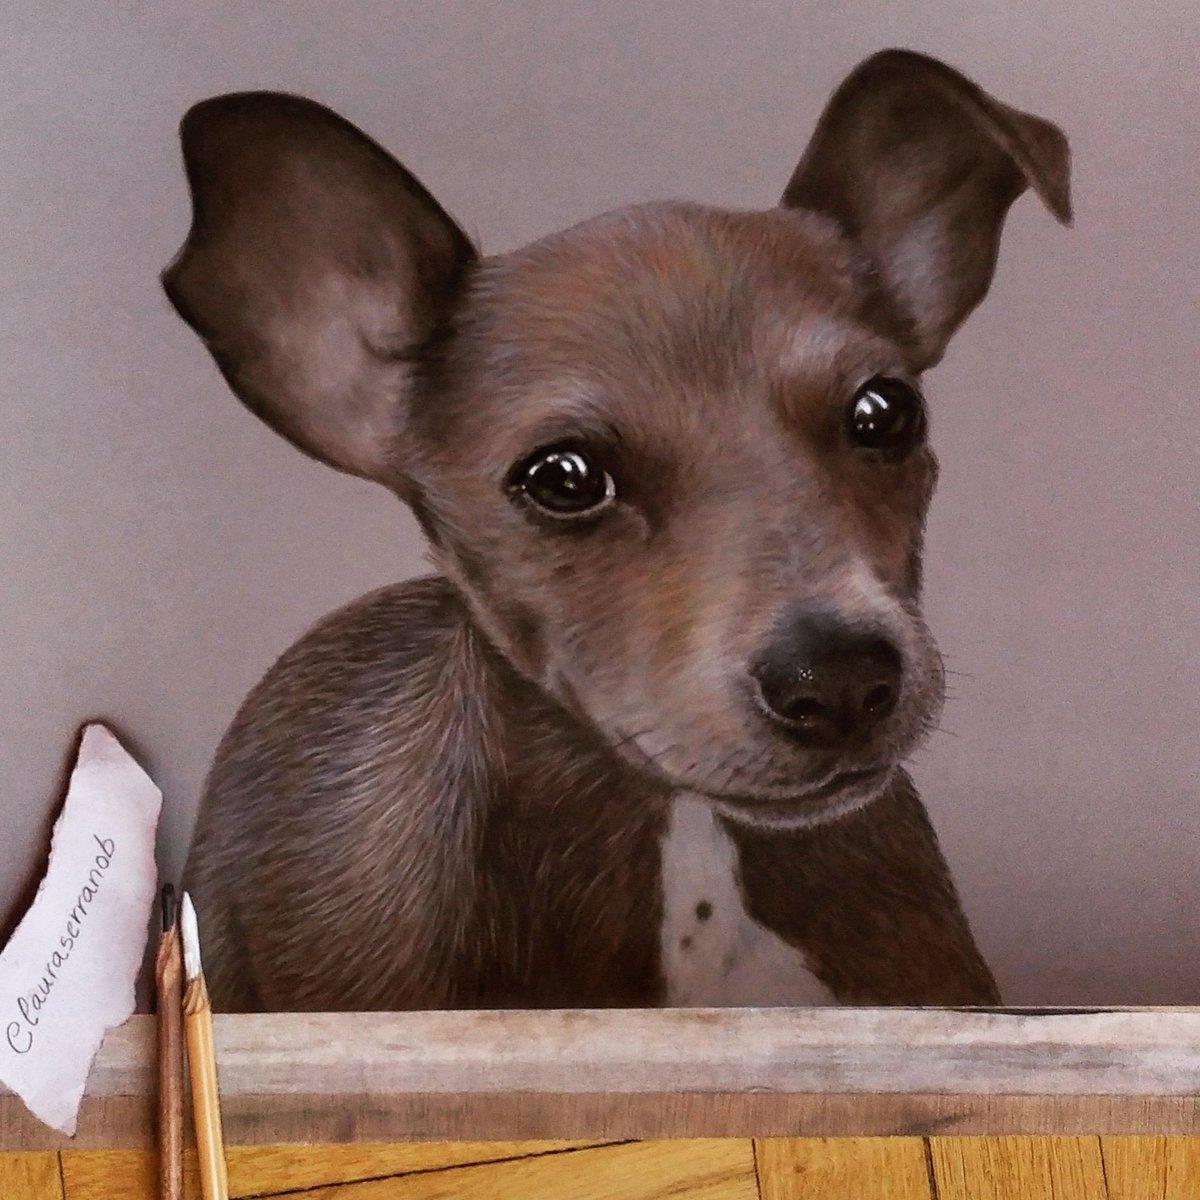 Chispa  La perrita de mi amigo @JessFernndezMo4 #dibujo #drawing #retrato #portrait #dogportrait  #dogdrawing #softpastel #pencil #pencildrawingpic.twitter.com/piT6r9gdbK